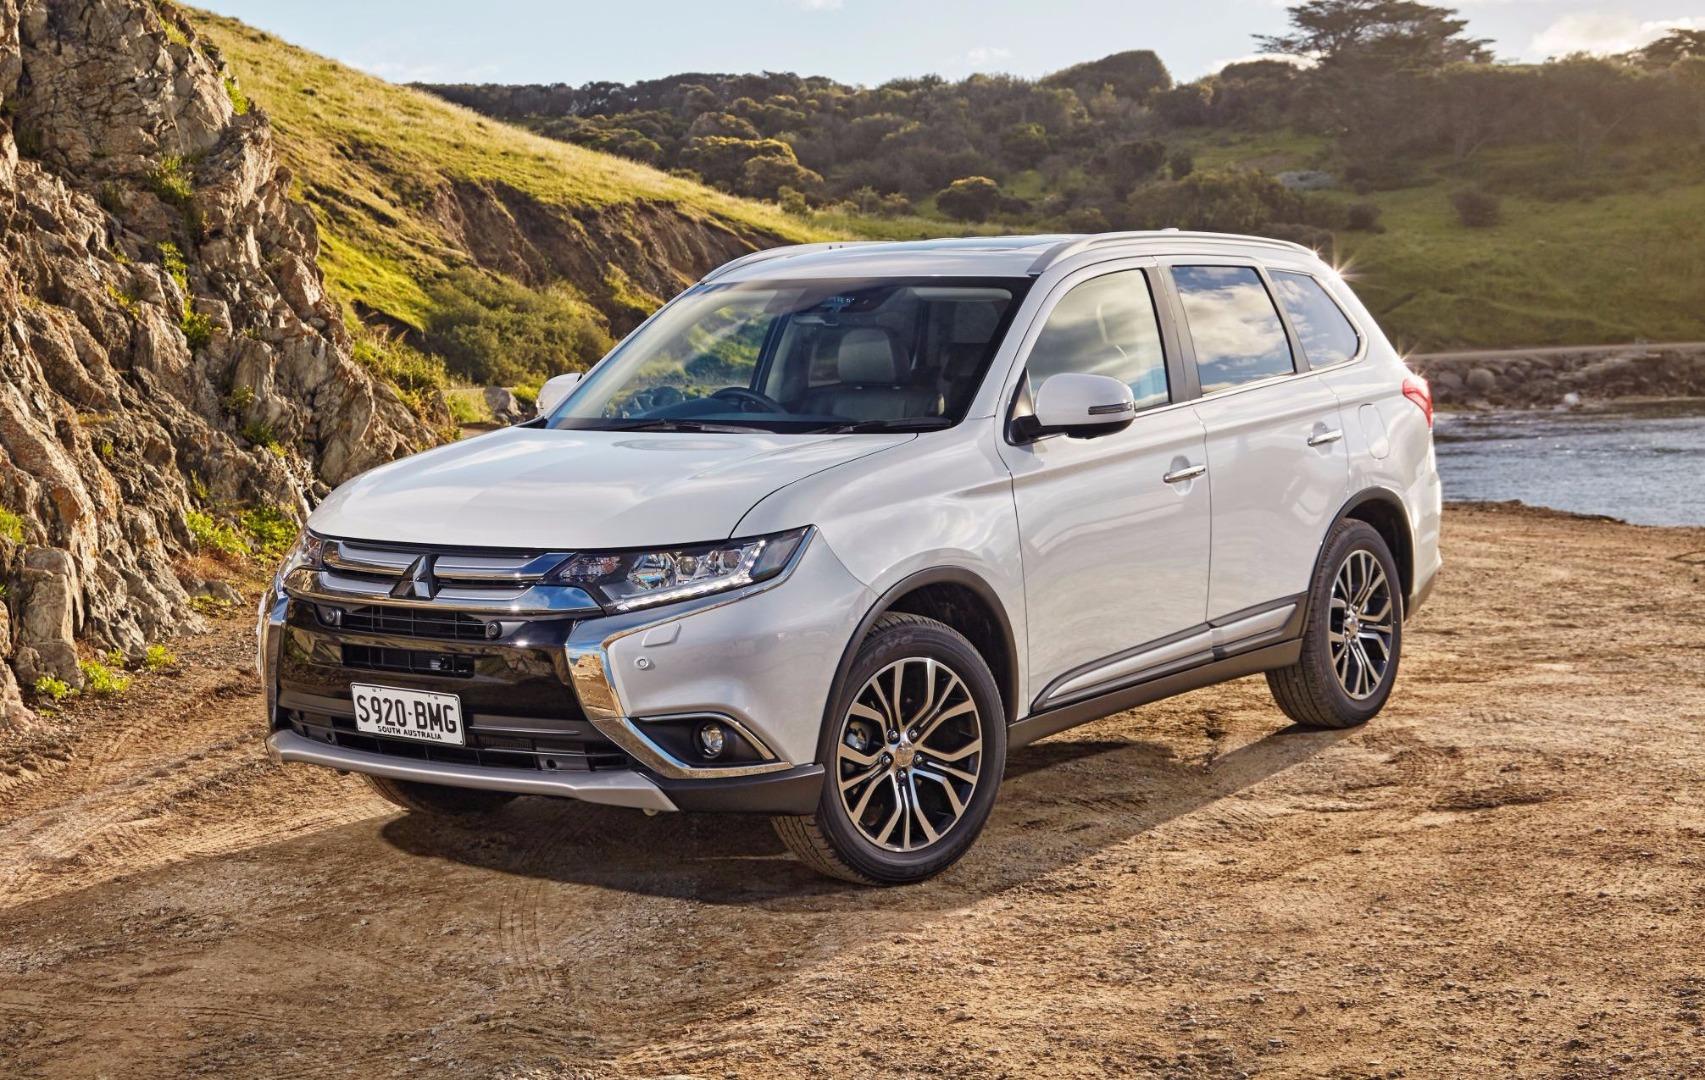 News Mitsubishi Australia Rolls Out 2017 Outlander Update